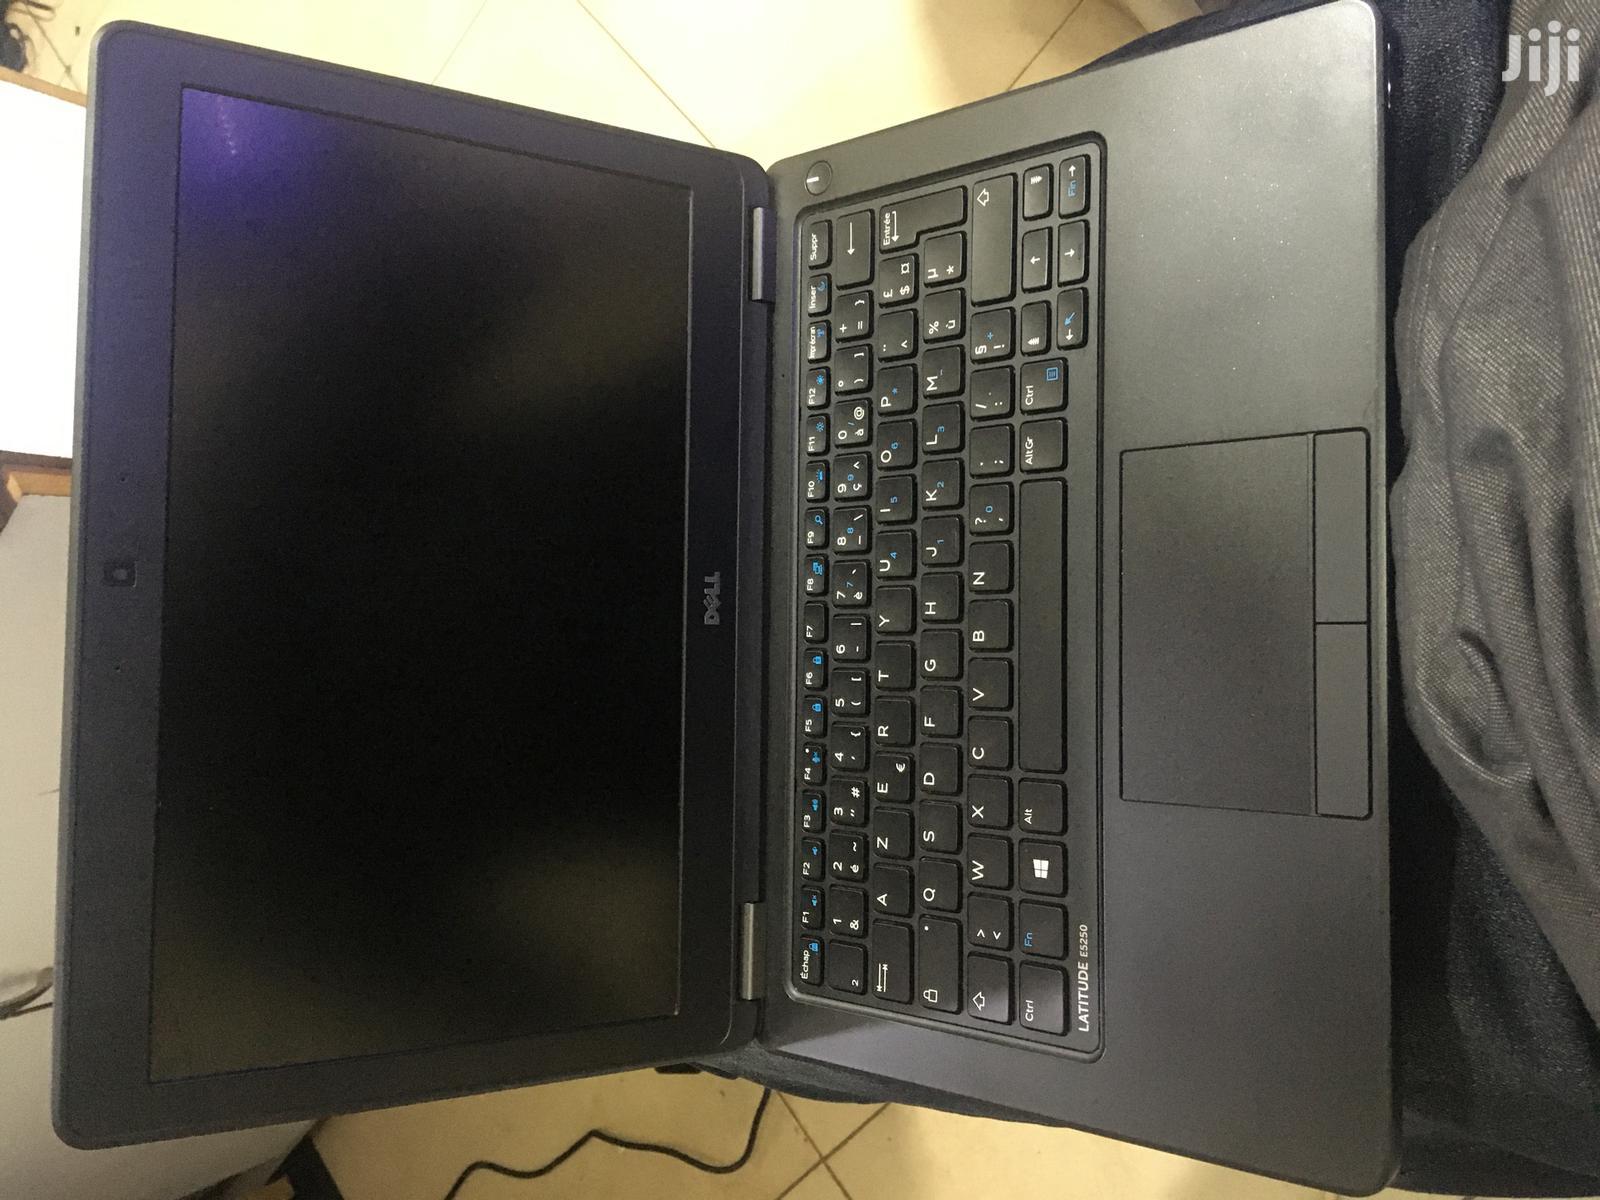 Laptop Dell Latitude 12 E5250 4GB Intel Core I5 HDD 500GB | Laptops & Computers for sale in Kampala, Central Region, Uganda